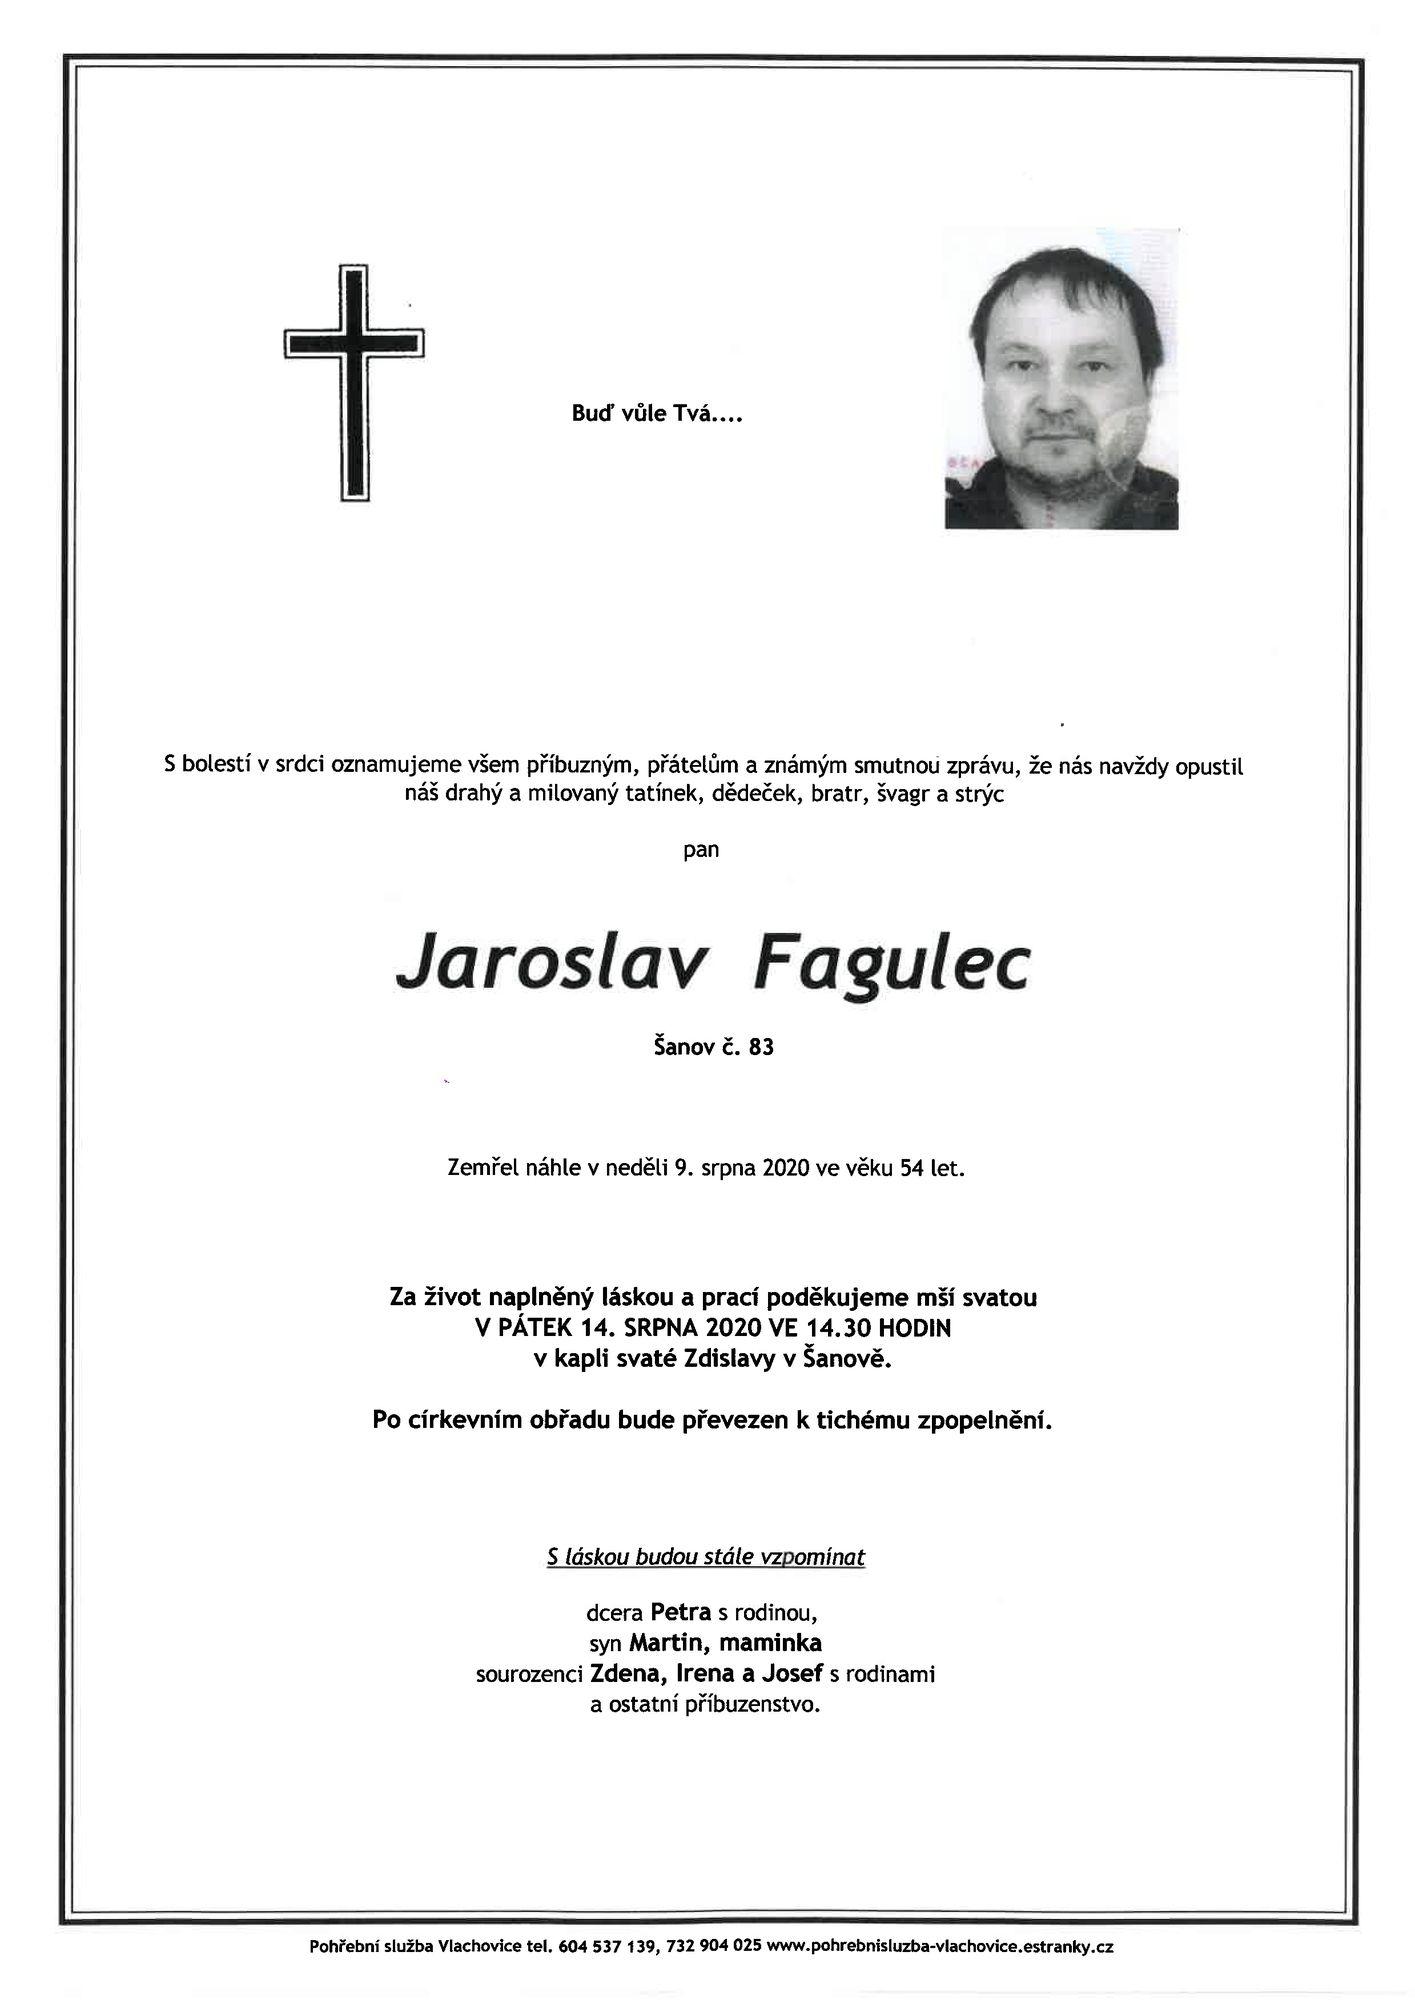 Jaroslav Fagulec